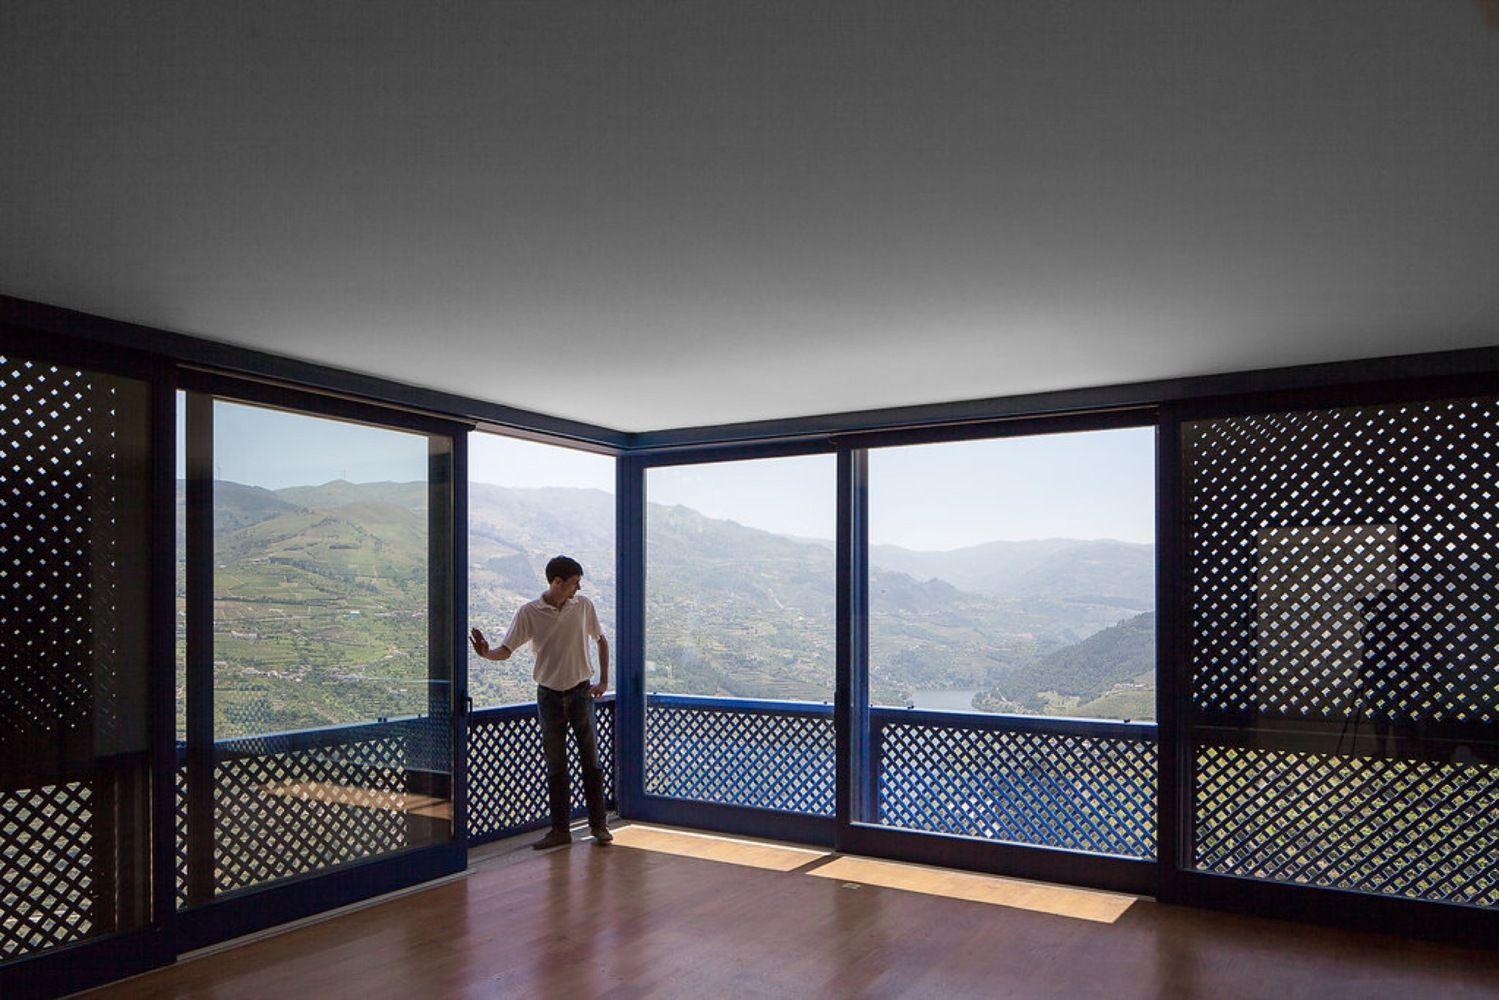 Gallery of Quinta da Boavista / SAMF Arquitectos - 4